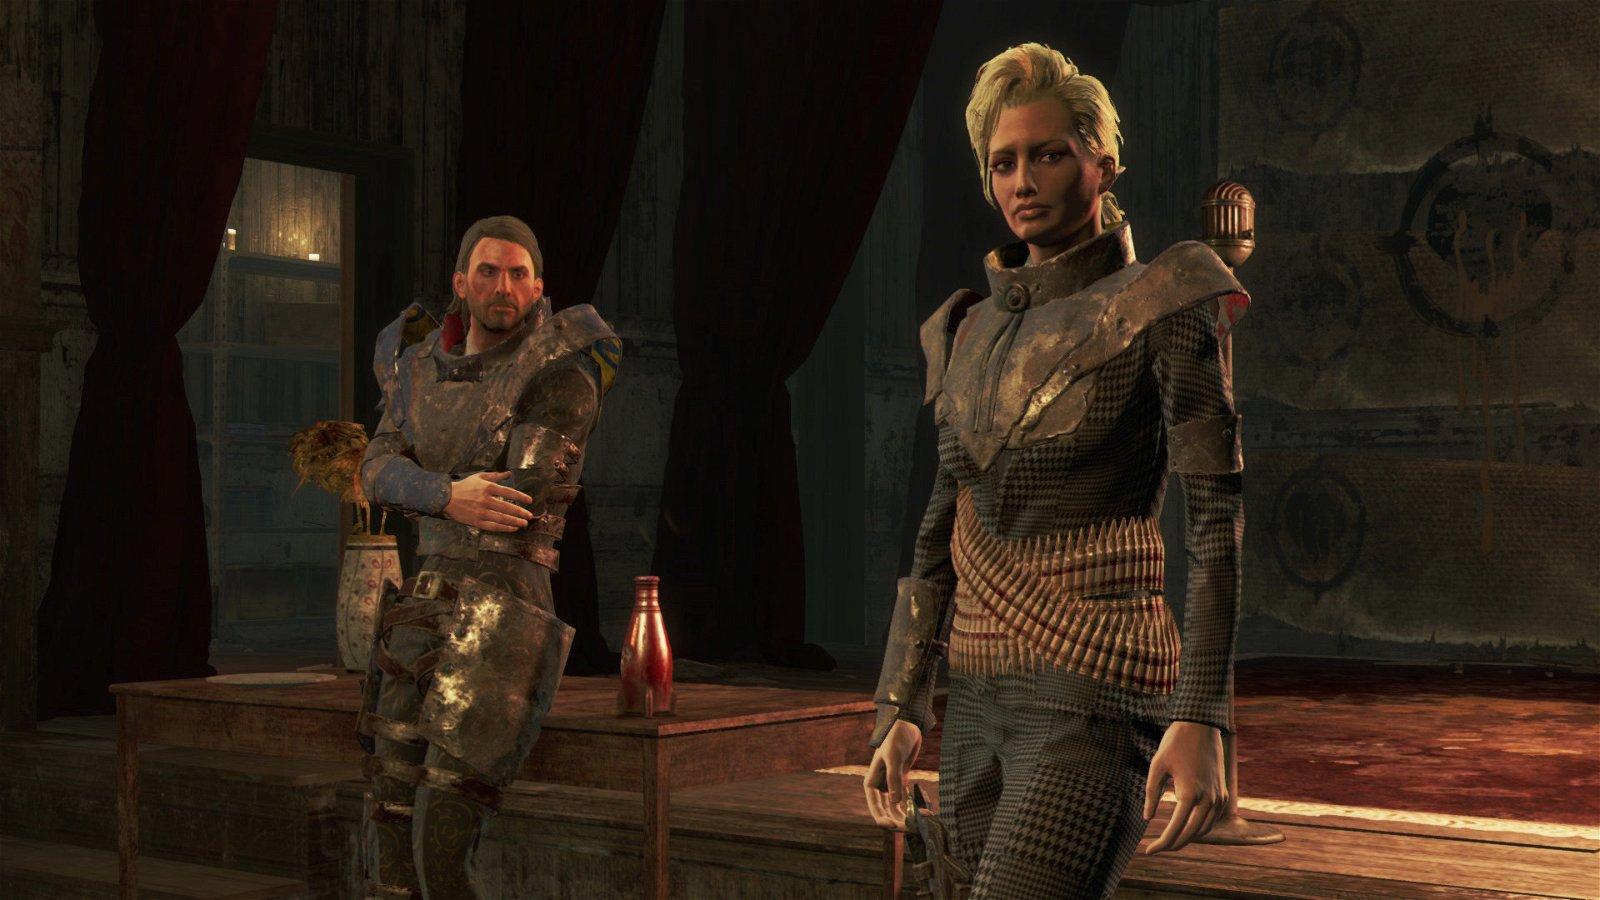 Fallout 4: Nuka-World Dlc (Ps4) Review 2